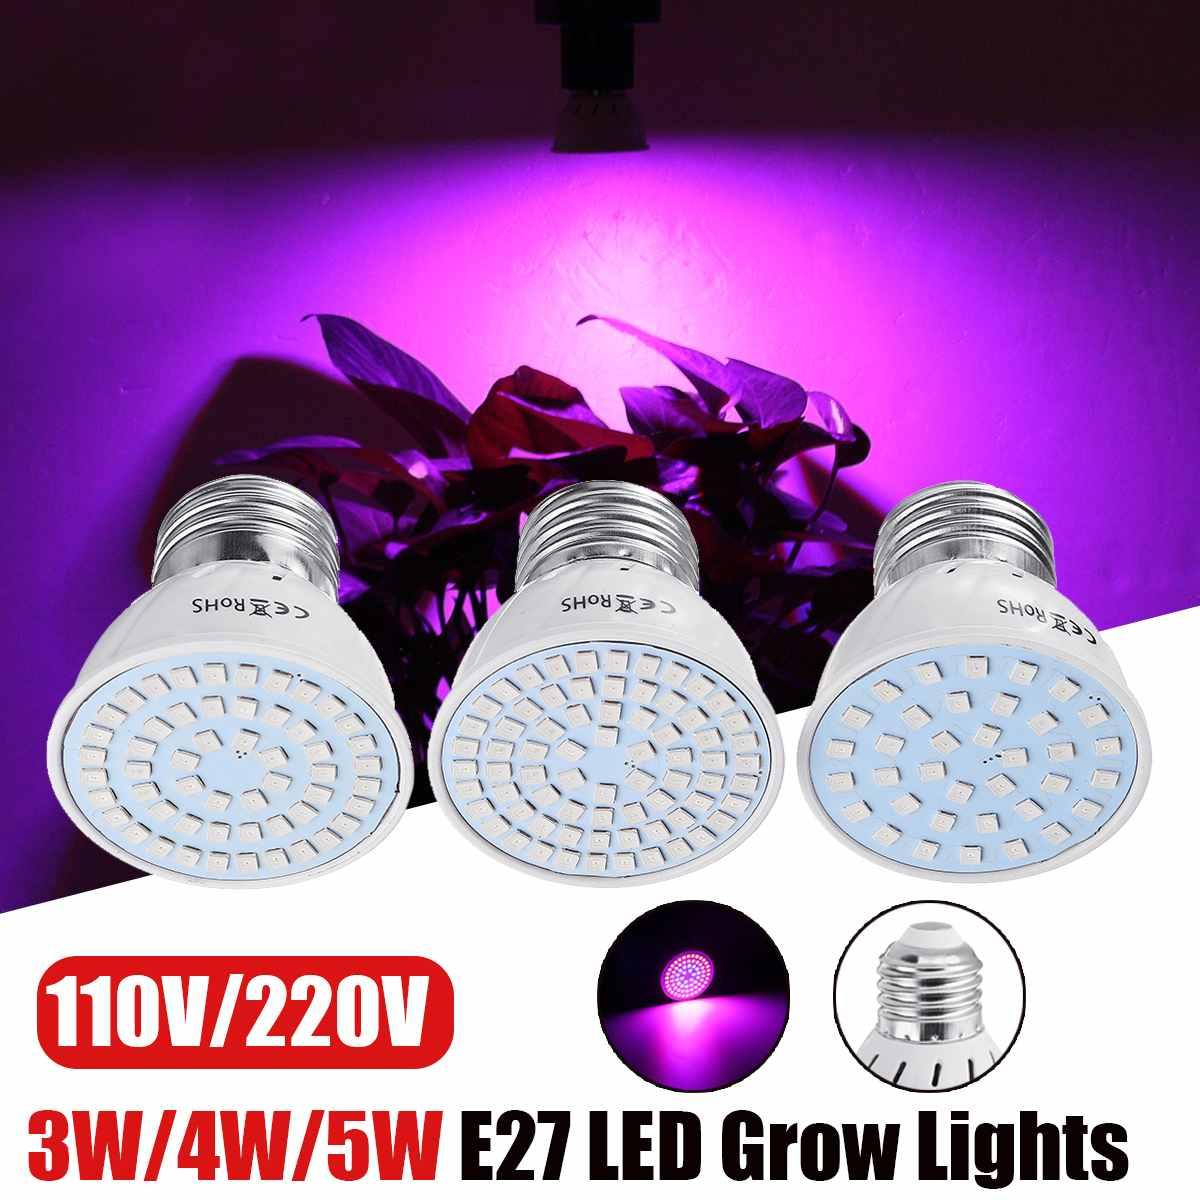 Luz de crecimiento hidropónico E27 LED luces de crecimiento espectro completo 220V lámpara UV planta flor plántulas invernadero 3 W/4 W/5 W